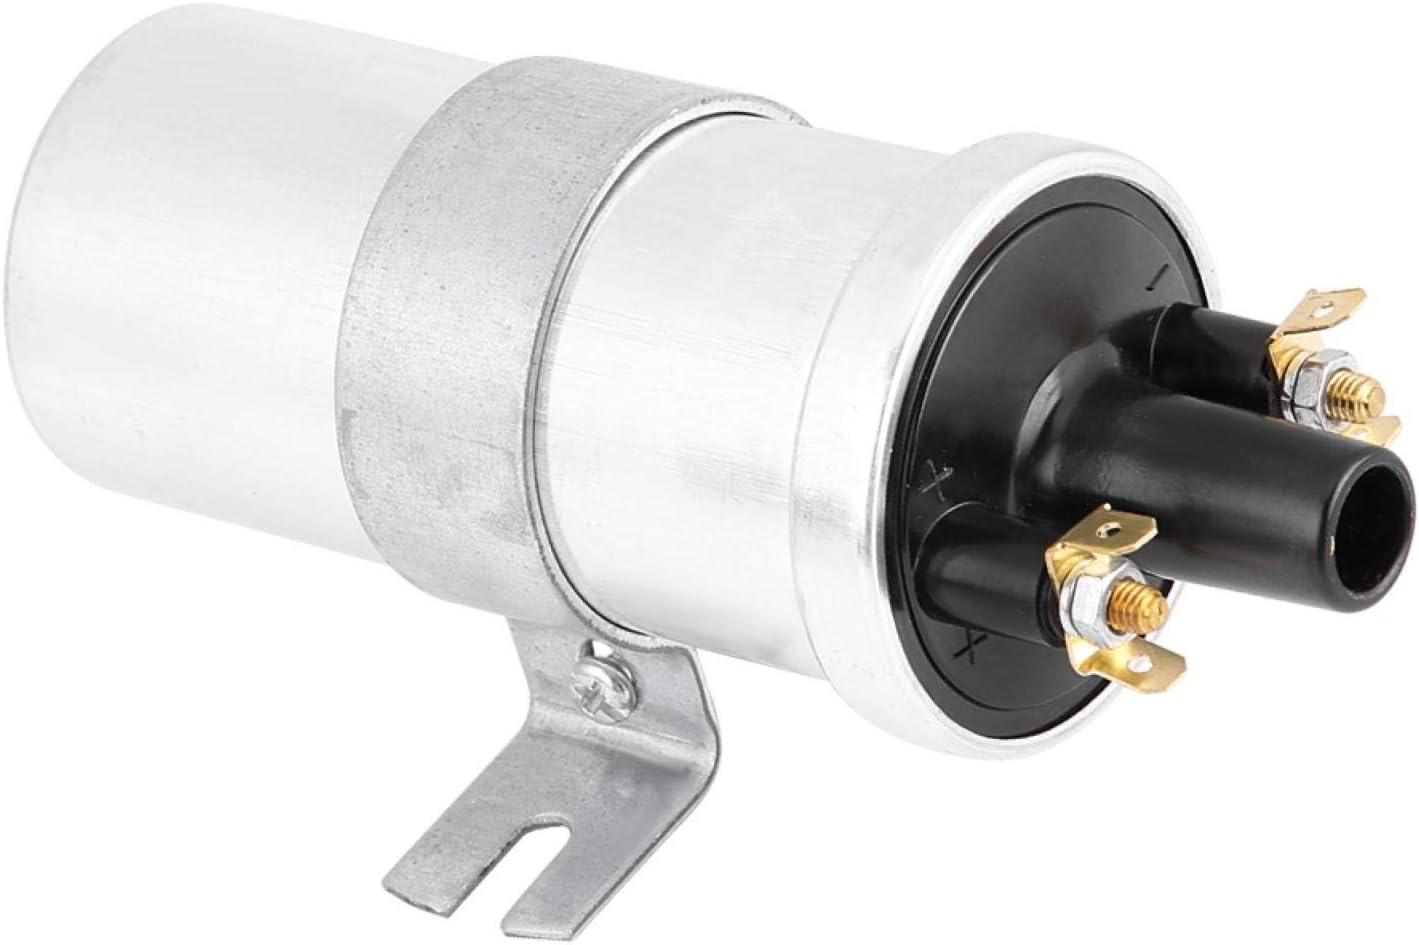 Bobina de encendido para motor de automóvil, bobina de encendido sin balasto de 3 ohmios para aplicaciones Lucas de 12 voltios DLB101